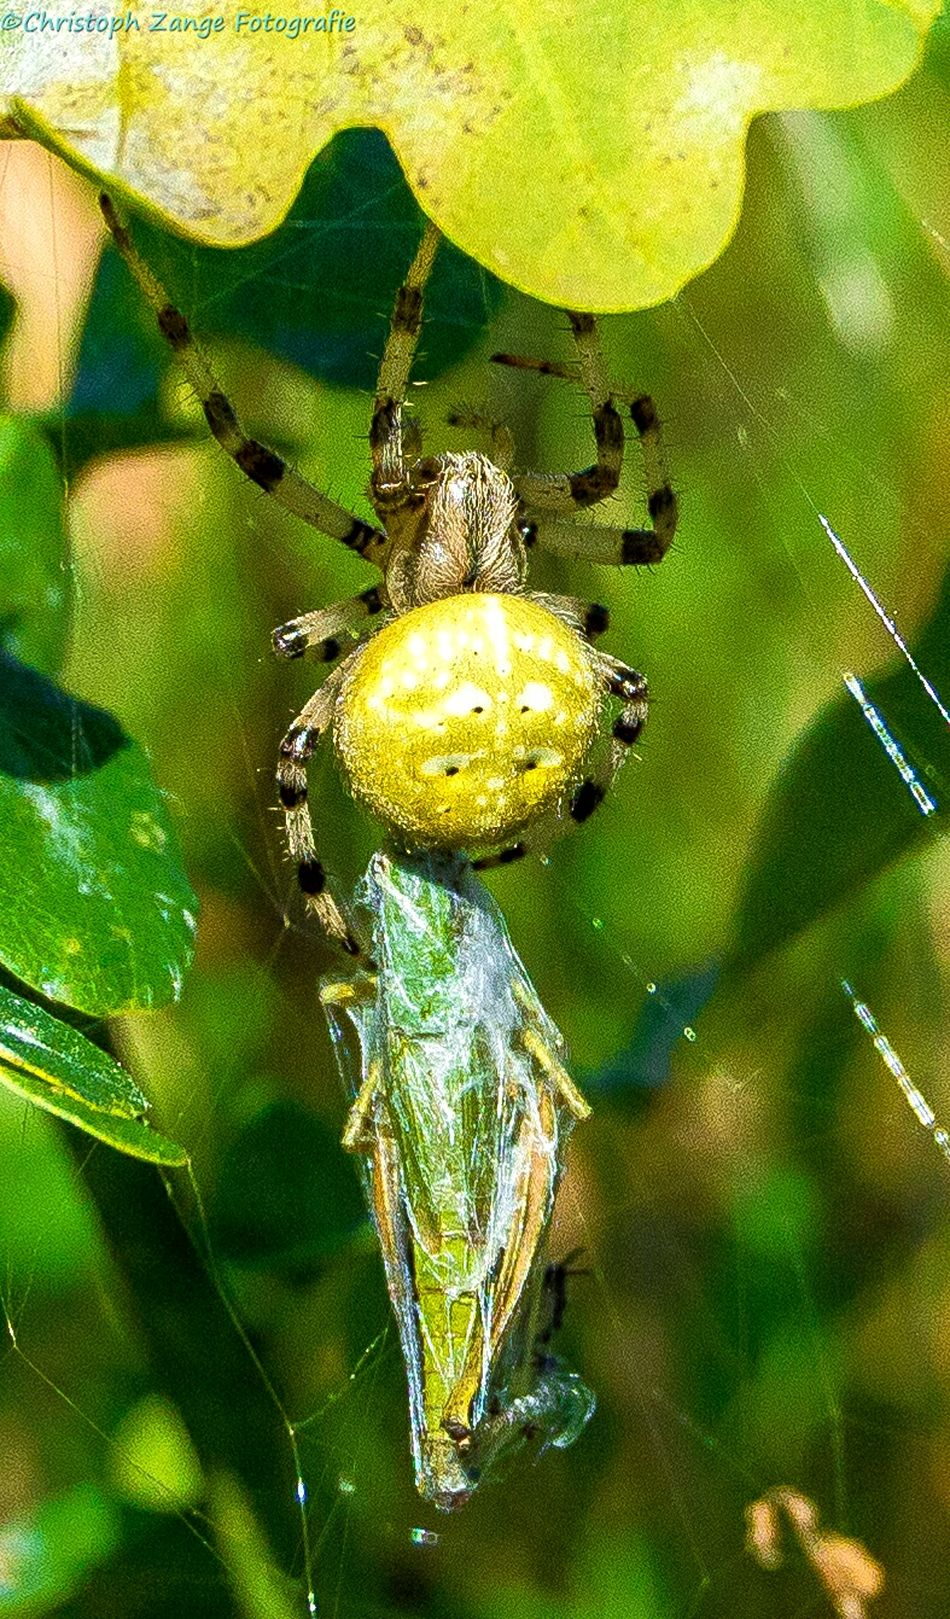 Spider with Dinner Close-up Plant Focus On Foreground Flower Nature Macro Westerwald Wirges Landschaft Green Nature Photography Incects Garden Spider Webs Spider Spinne Fängt Beute Spinne Natur